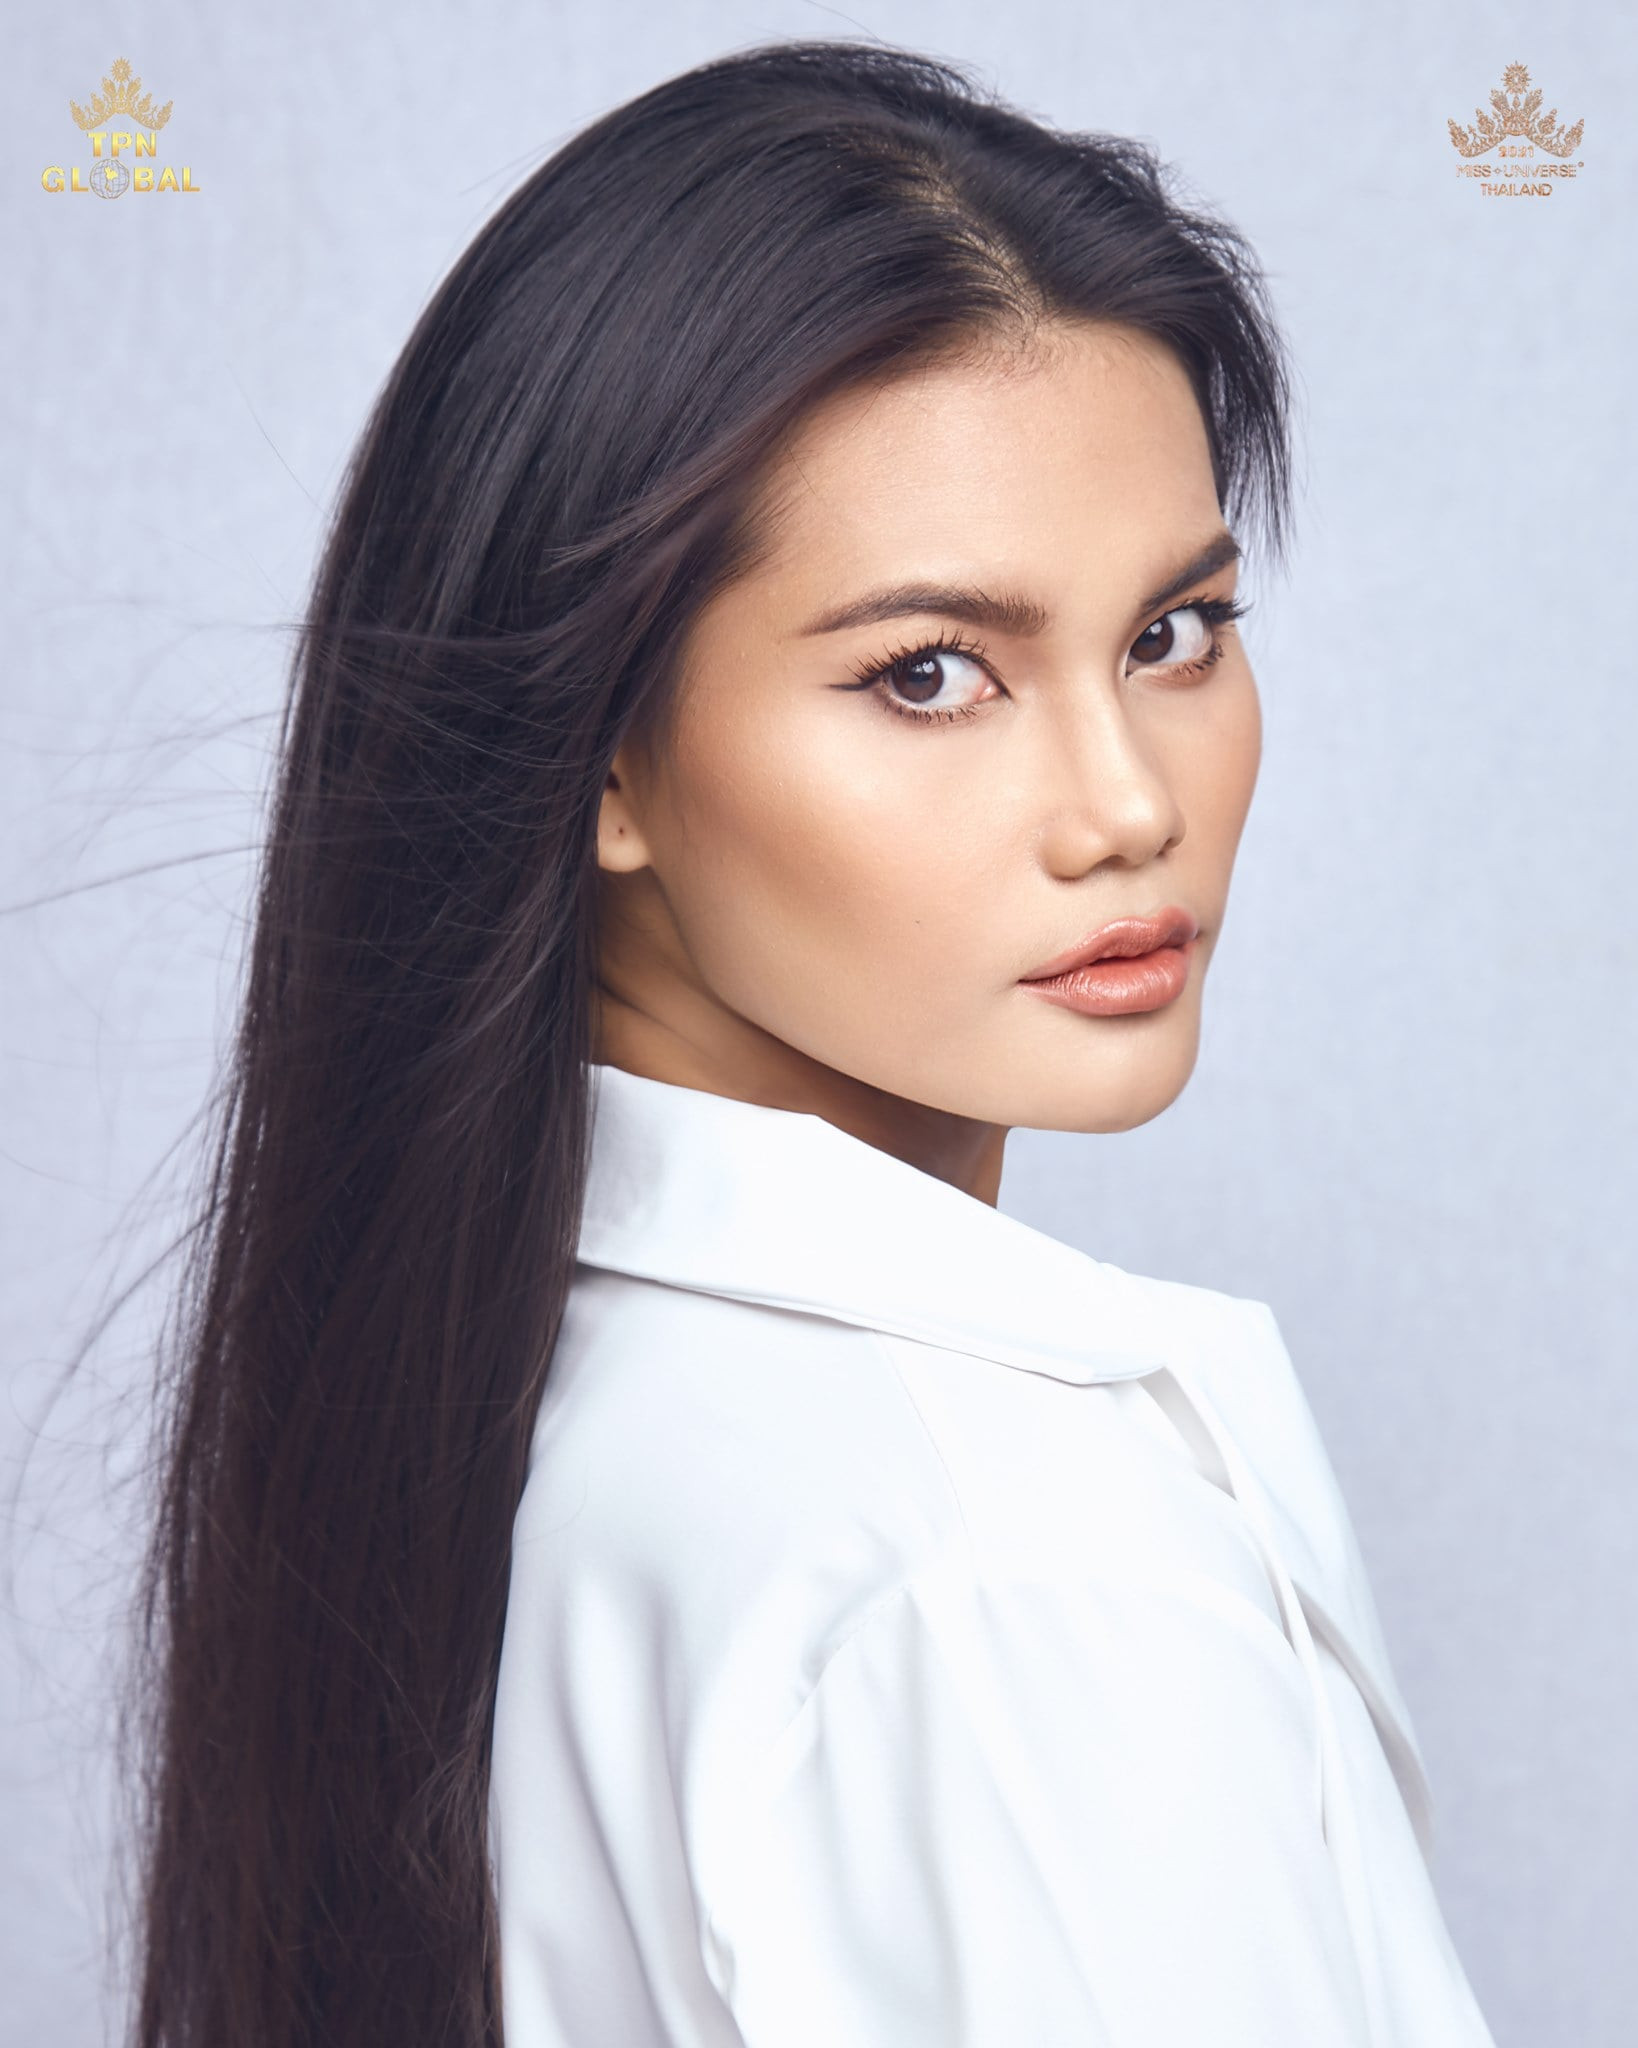 candidatas a miss universe thailand 2021. final: 24 oct. - Página 3 5dxzjj